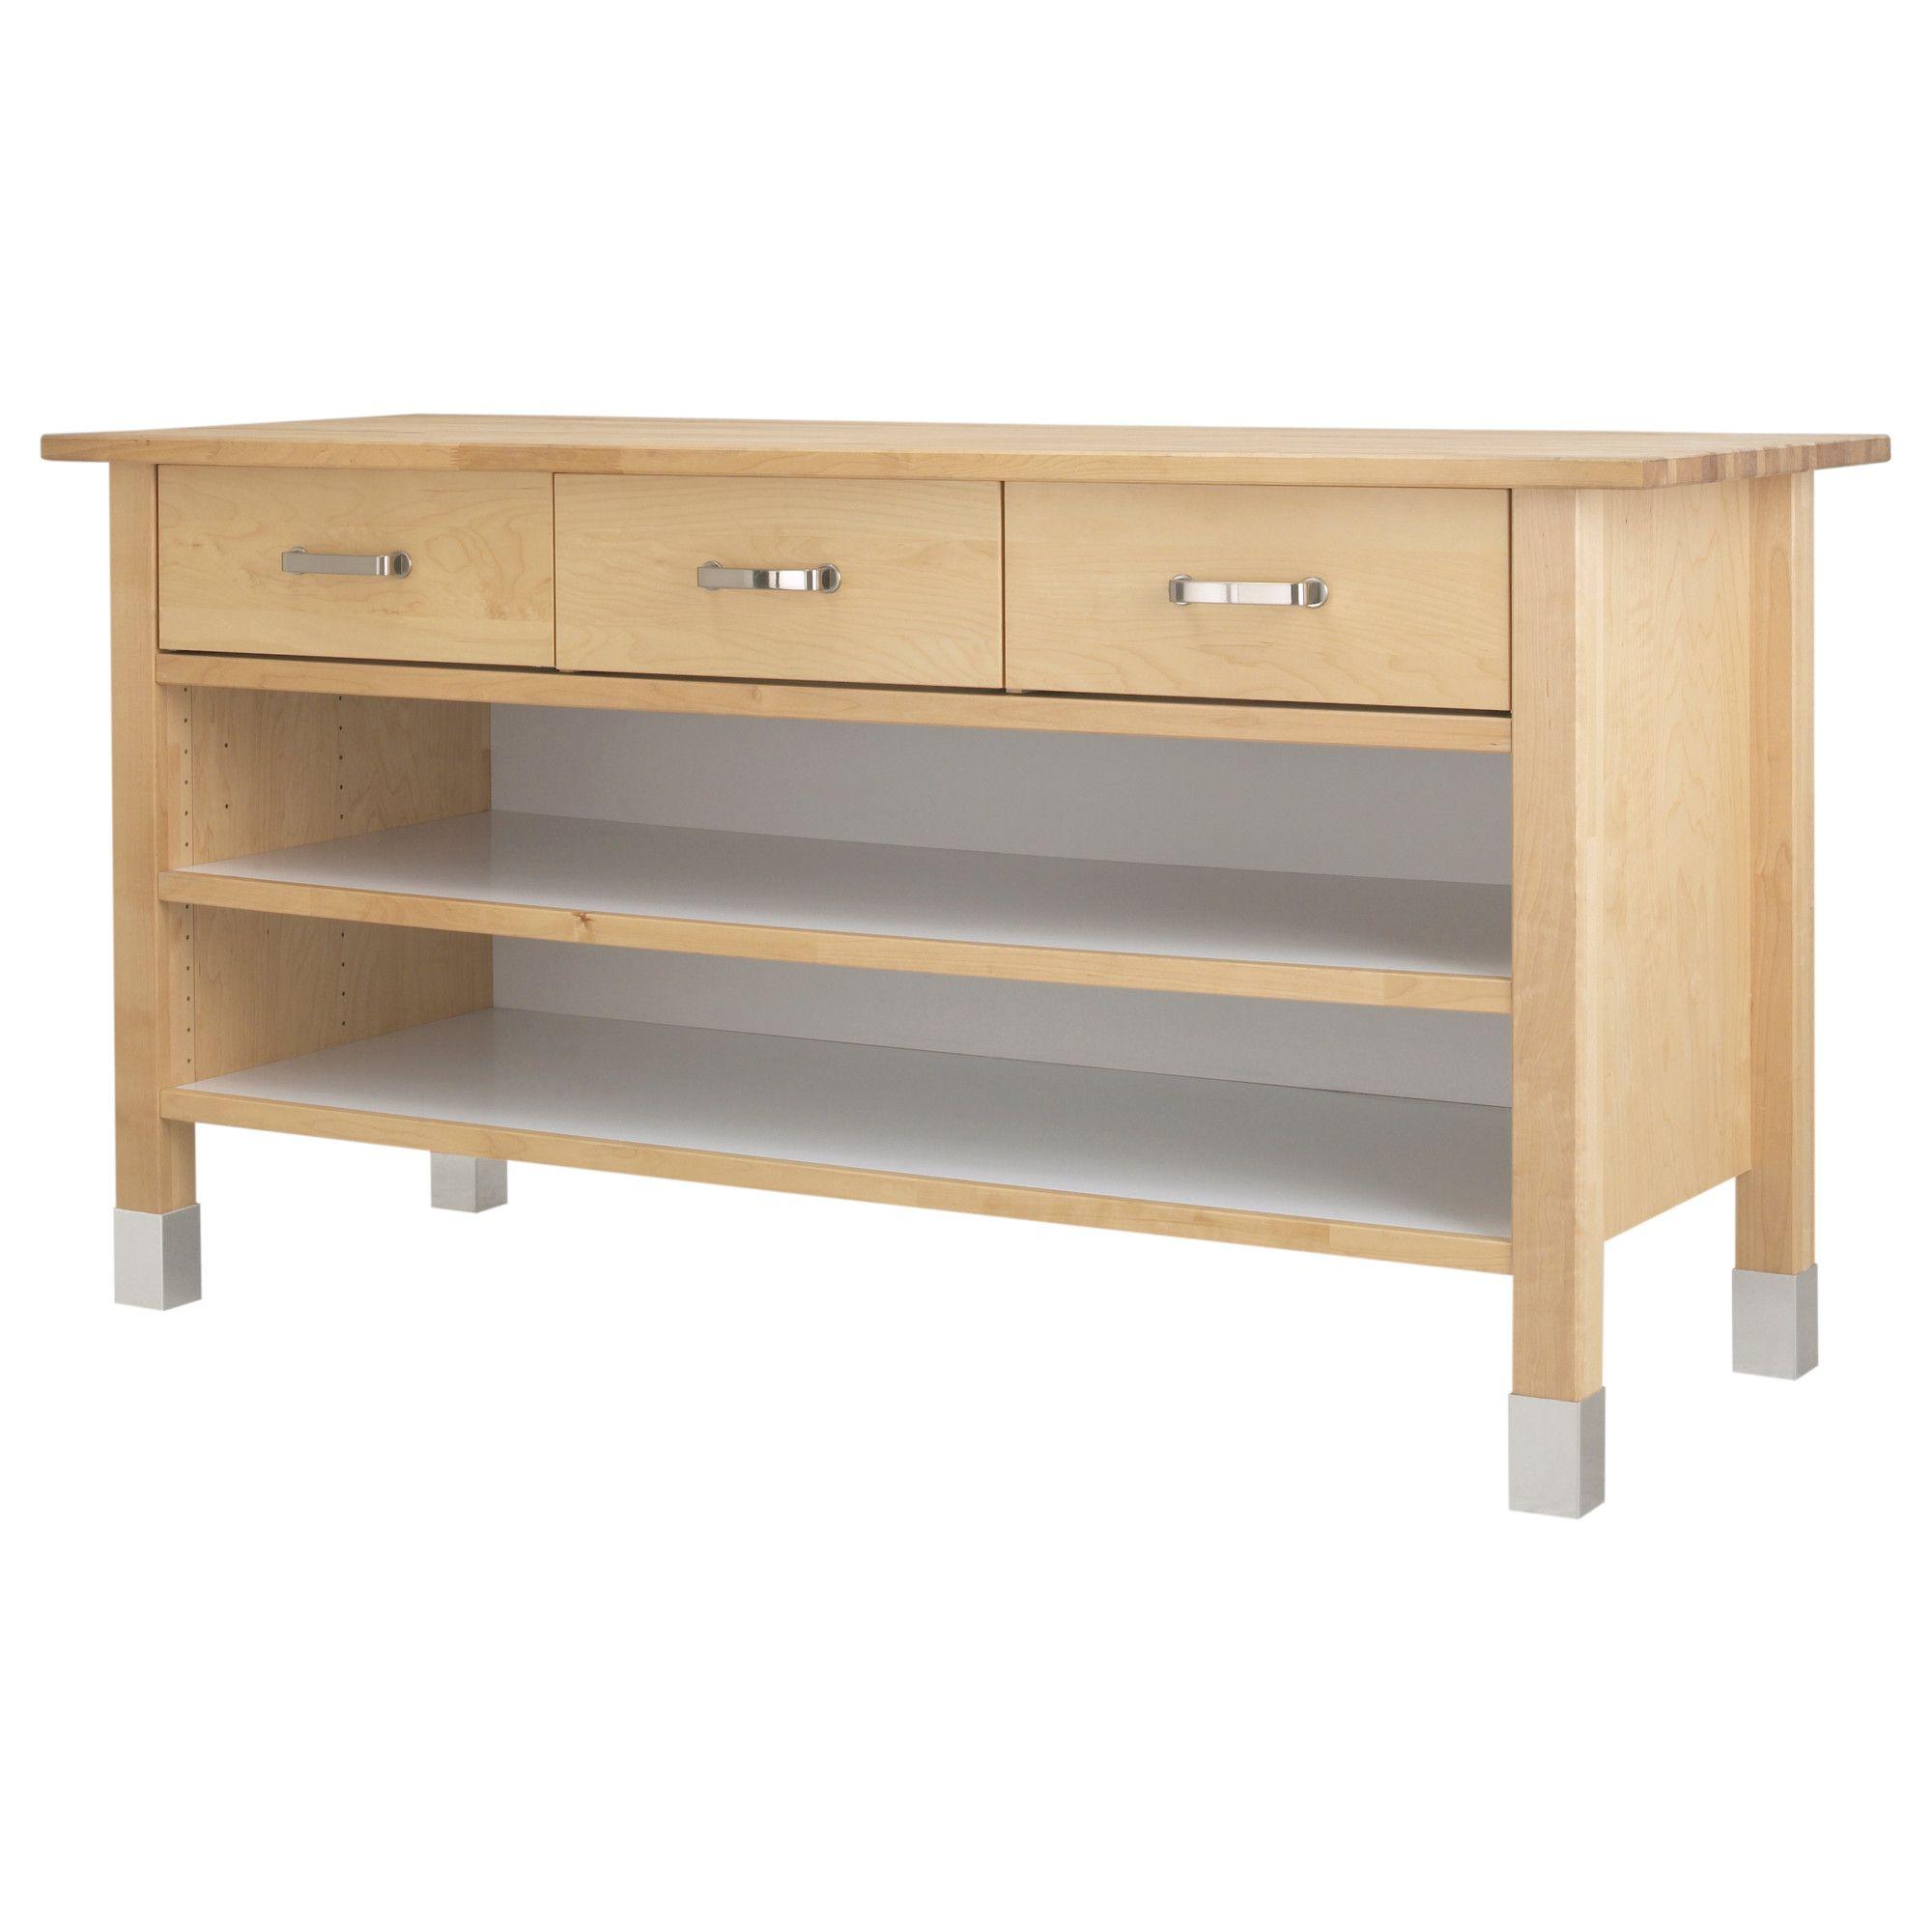 Tavoli Da Lavoro Cucina Ikea.Varde Mobile Base Ikea Idee Ikea Cucina Freestanding E